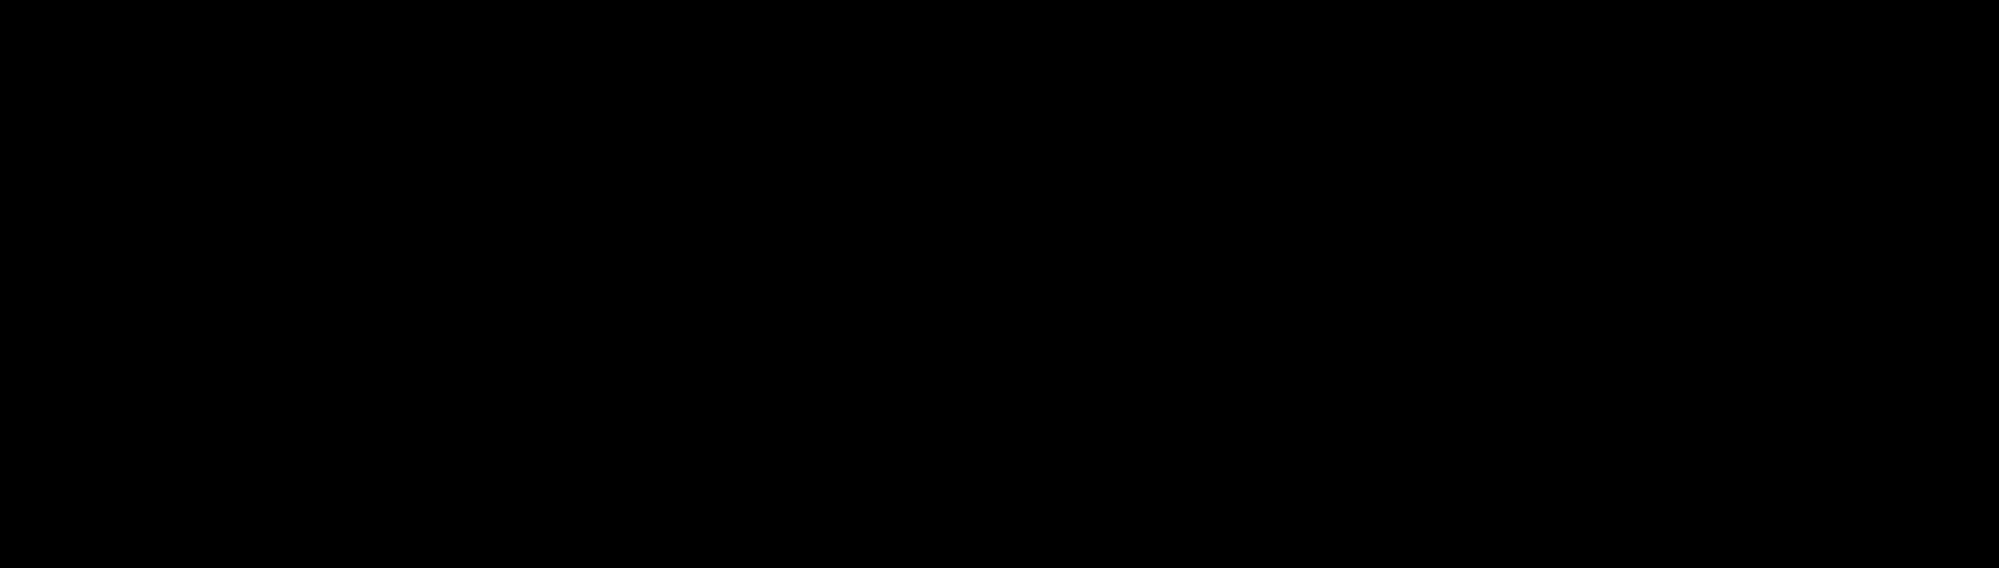 Südwestrundfunk